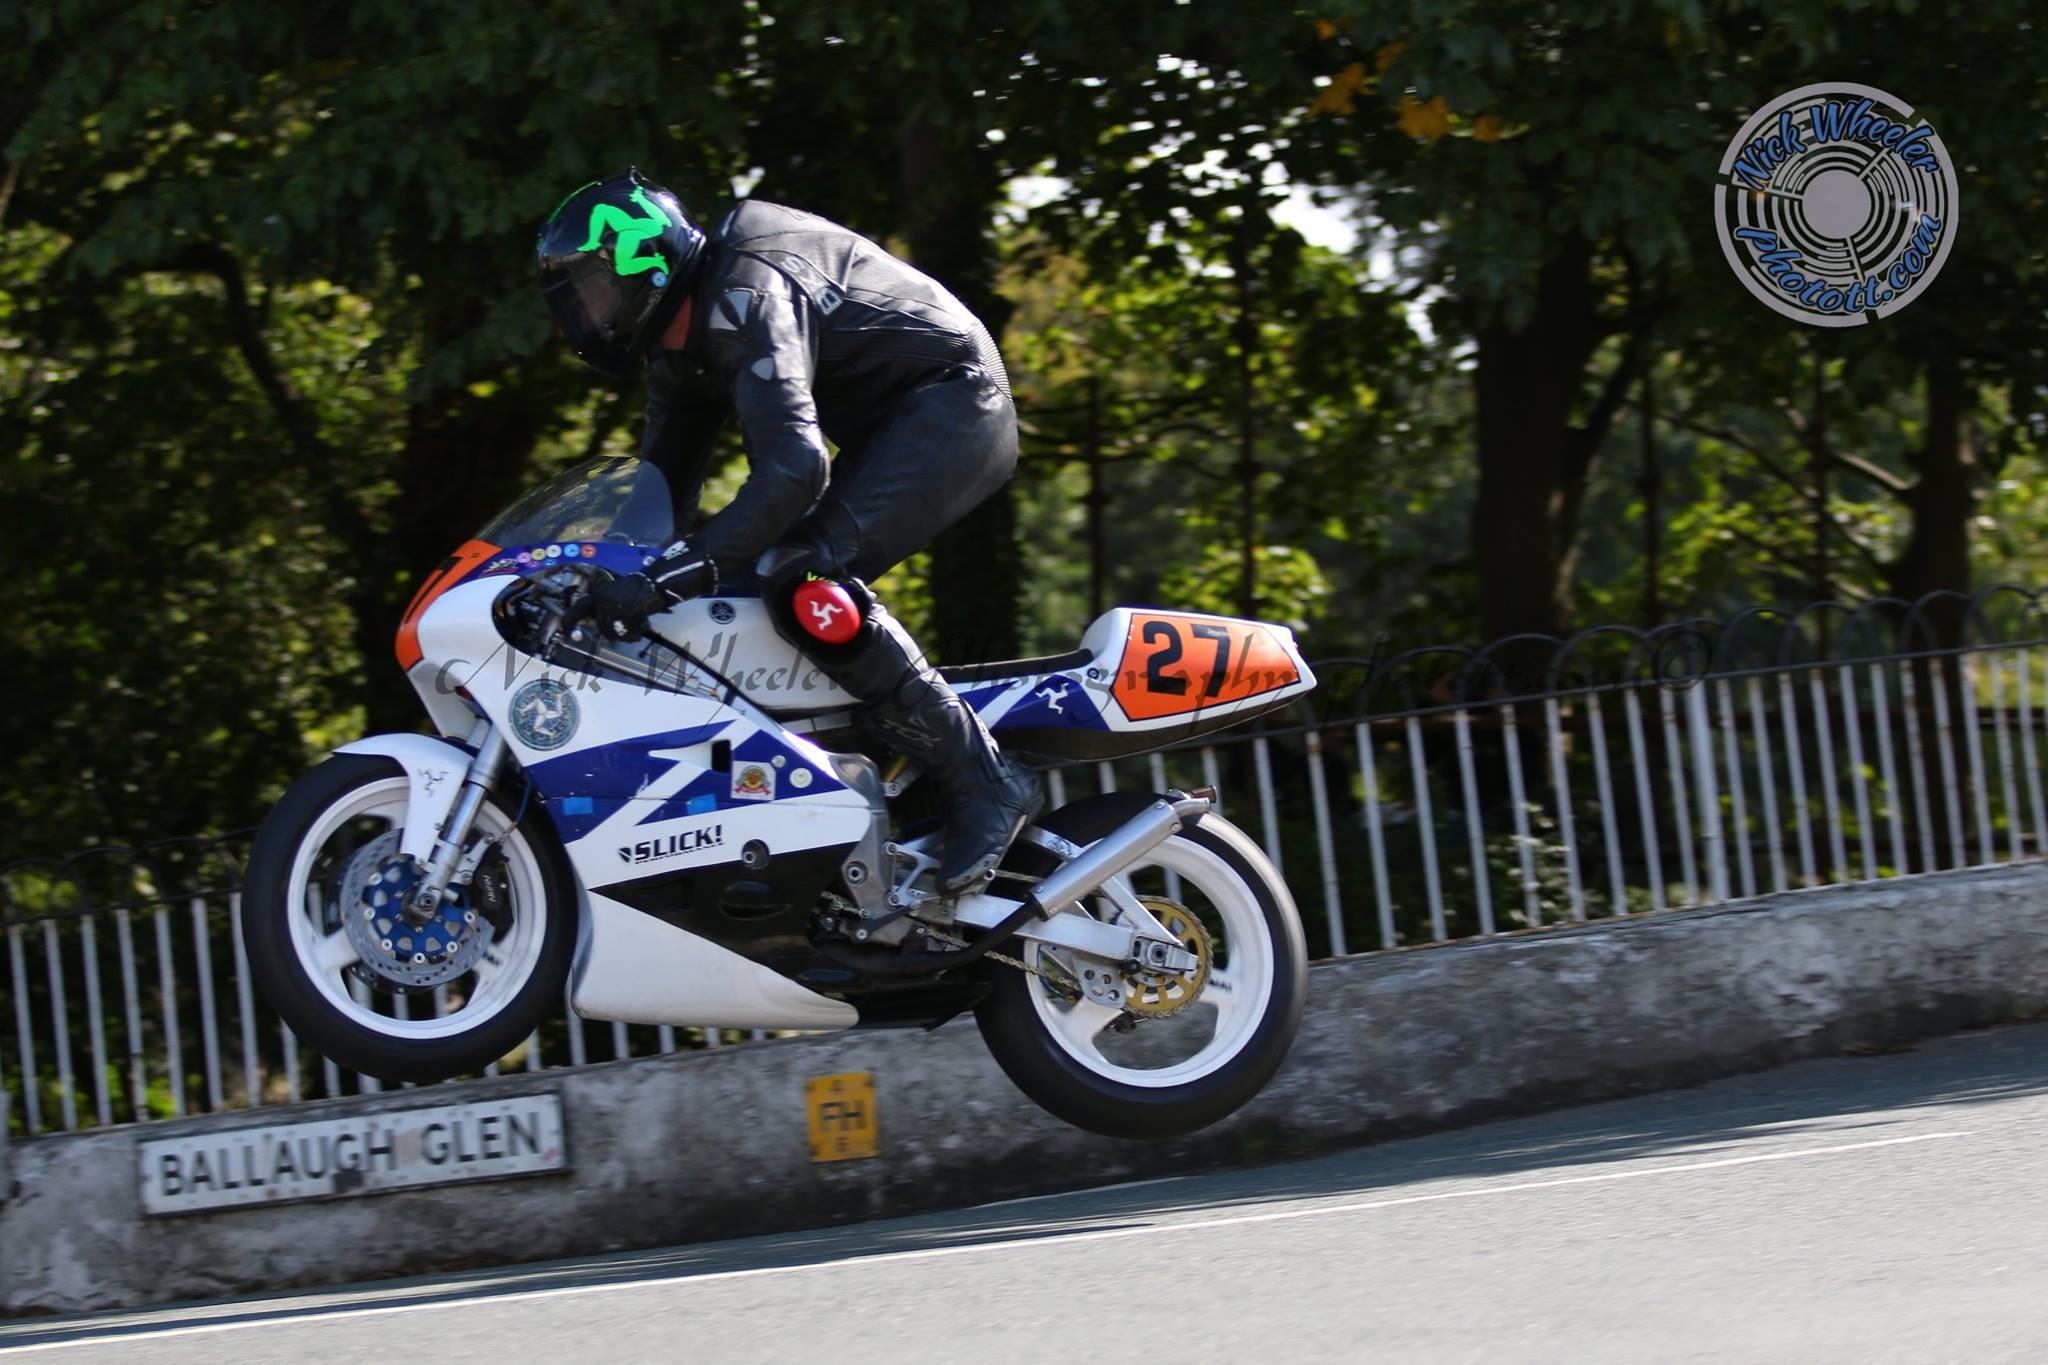 Manx GP Top 6: Steve Ault